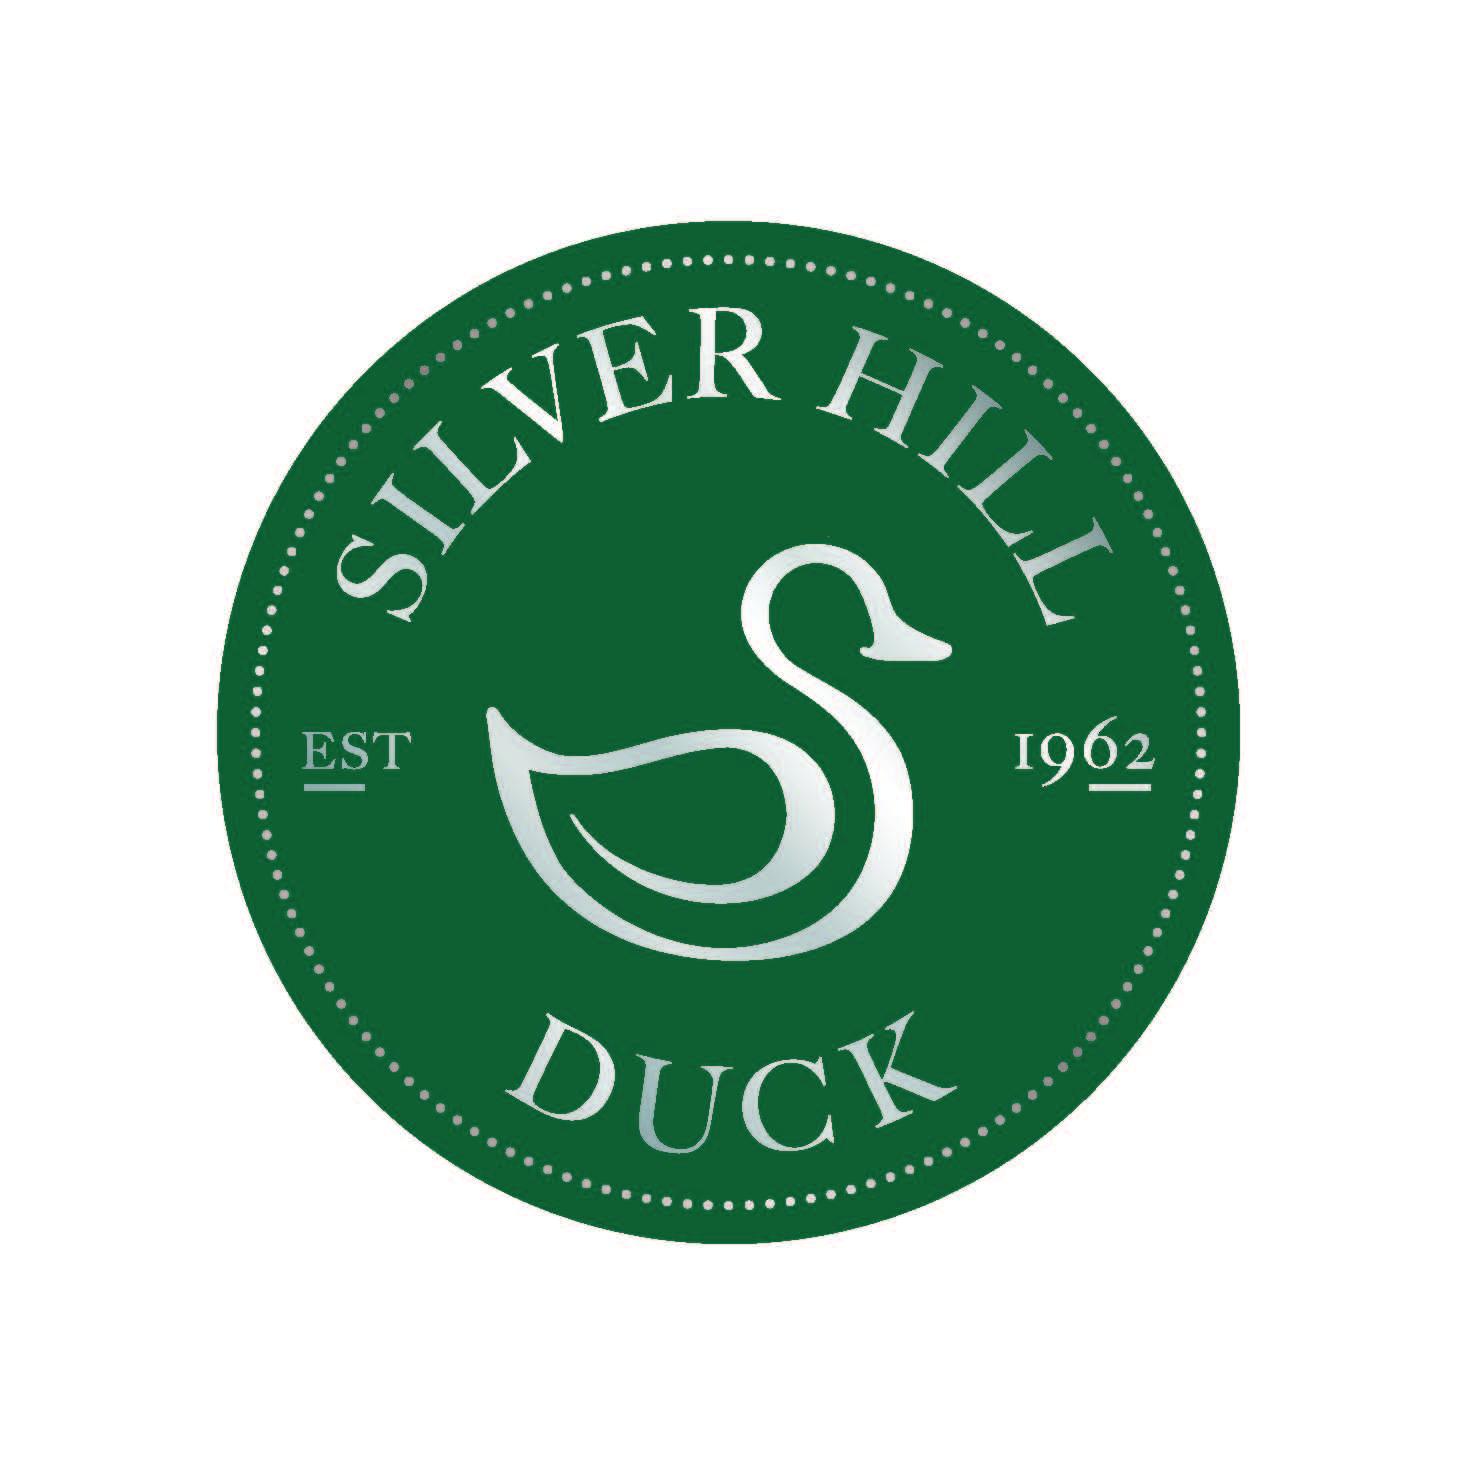 Silver Hill Duck logotype